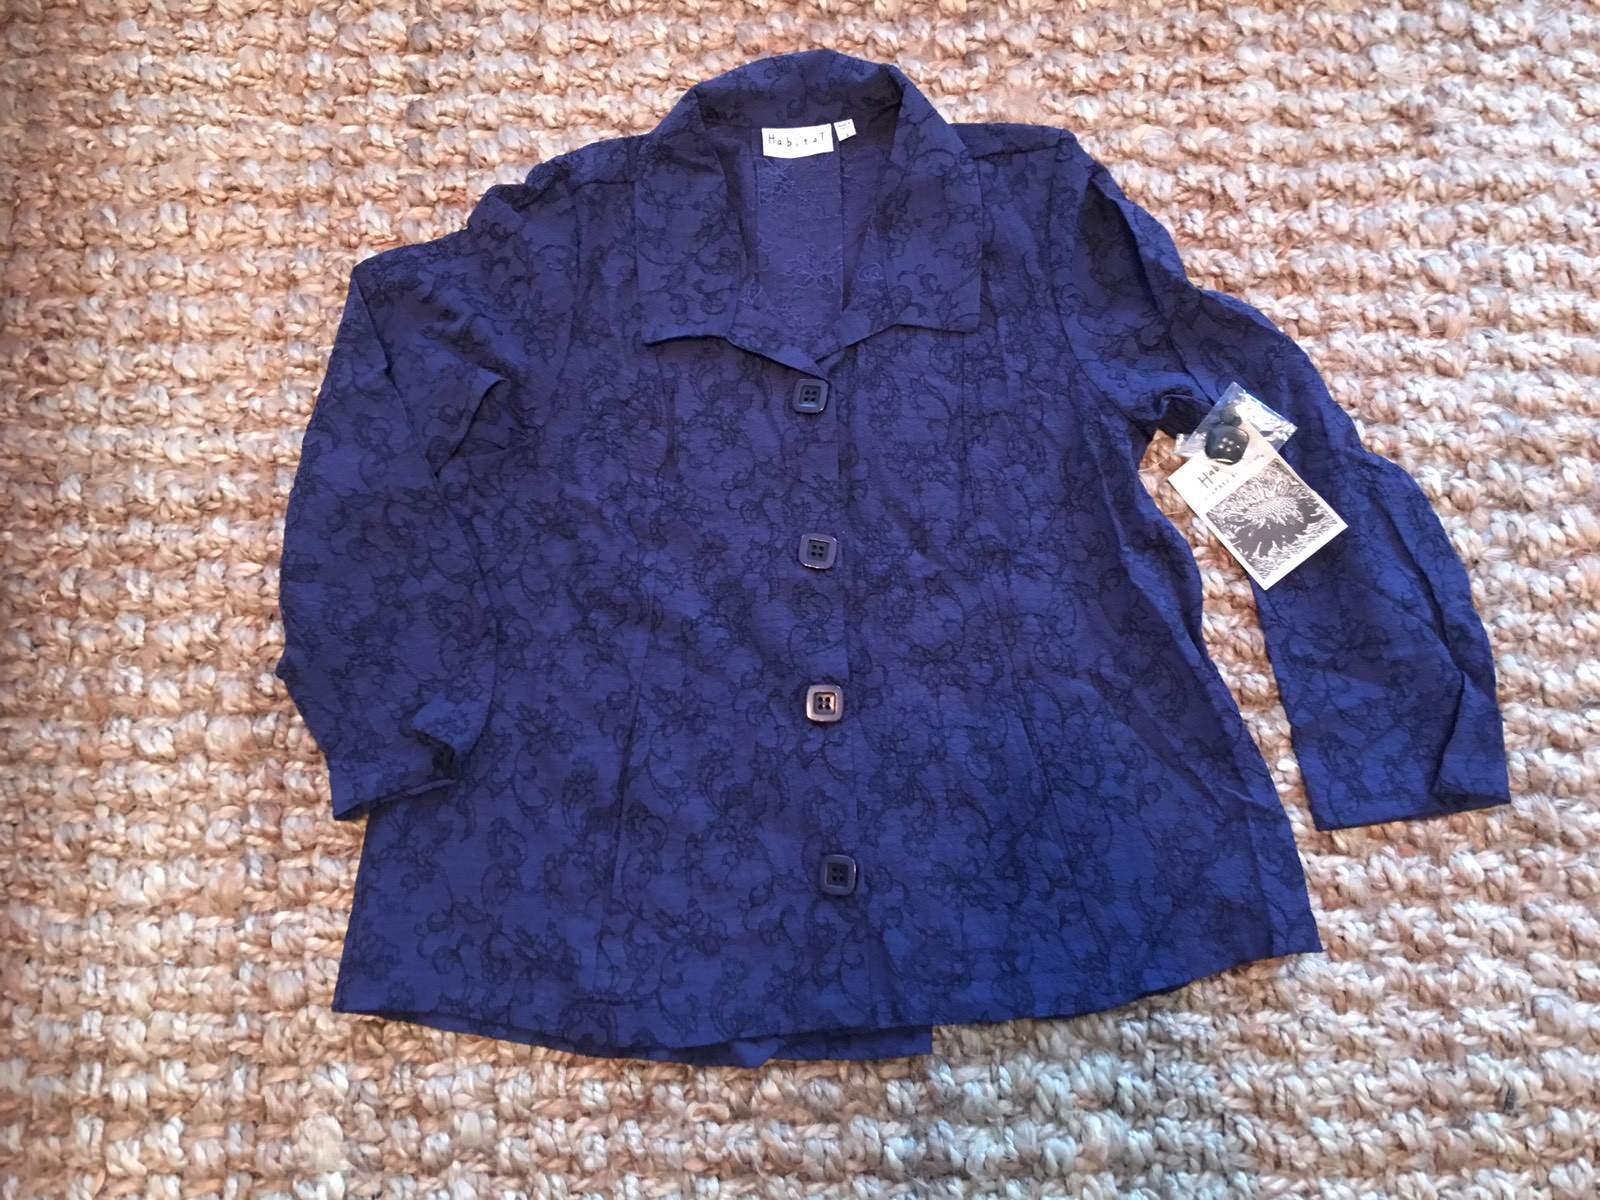 Habitat Embroiderot Midnight Jacket SHIRT.Größe XS.NWT .